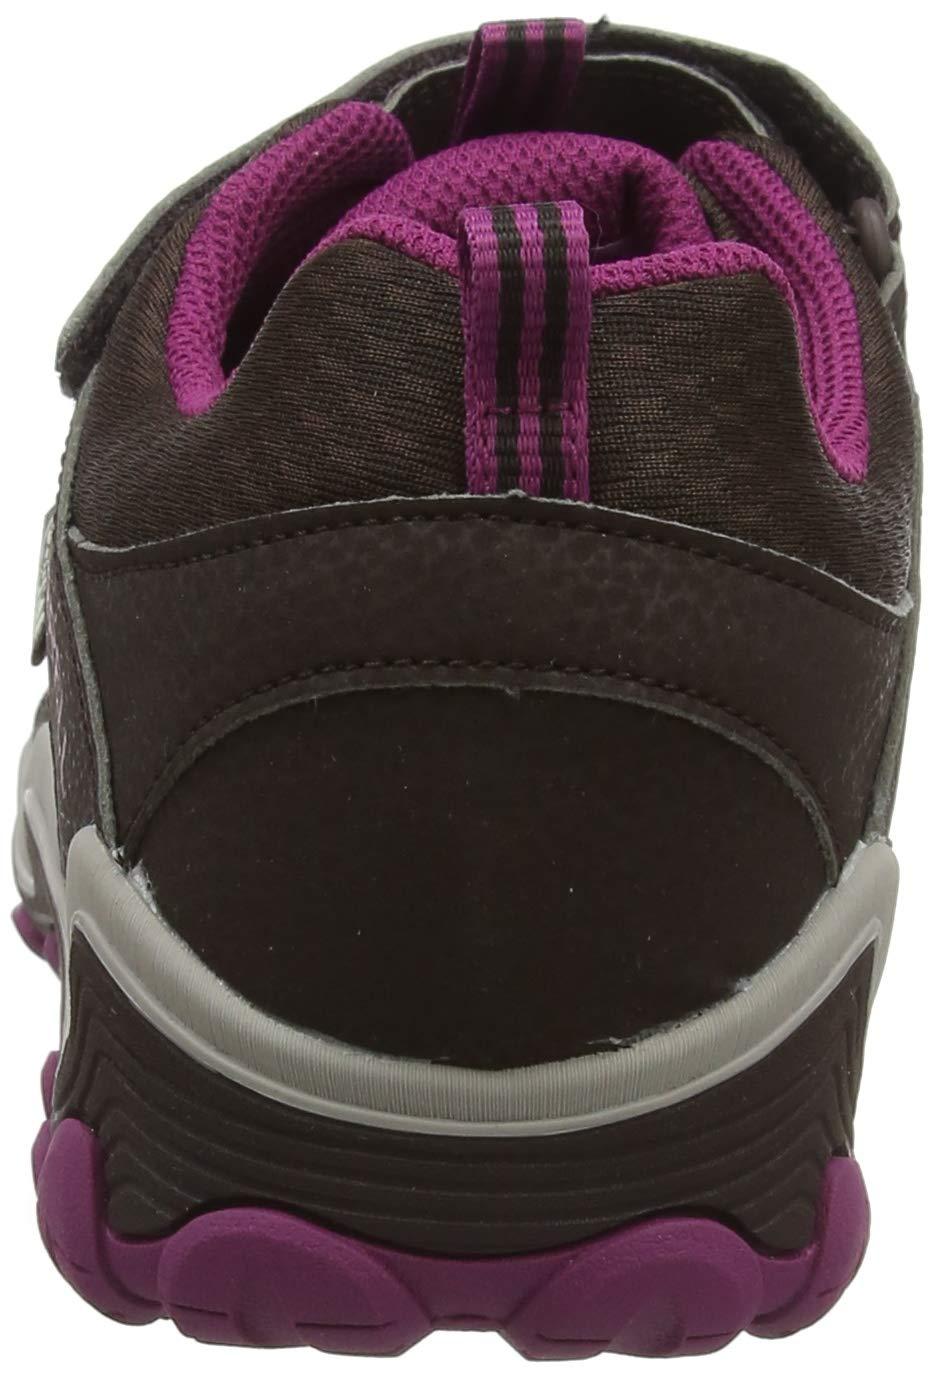 Merrell Unisex Kids M-Chameleon 7 Low a/C Waterproof Rise Hiking Boots 2